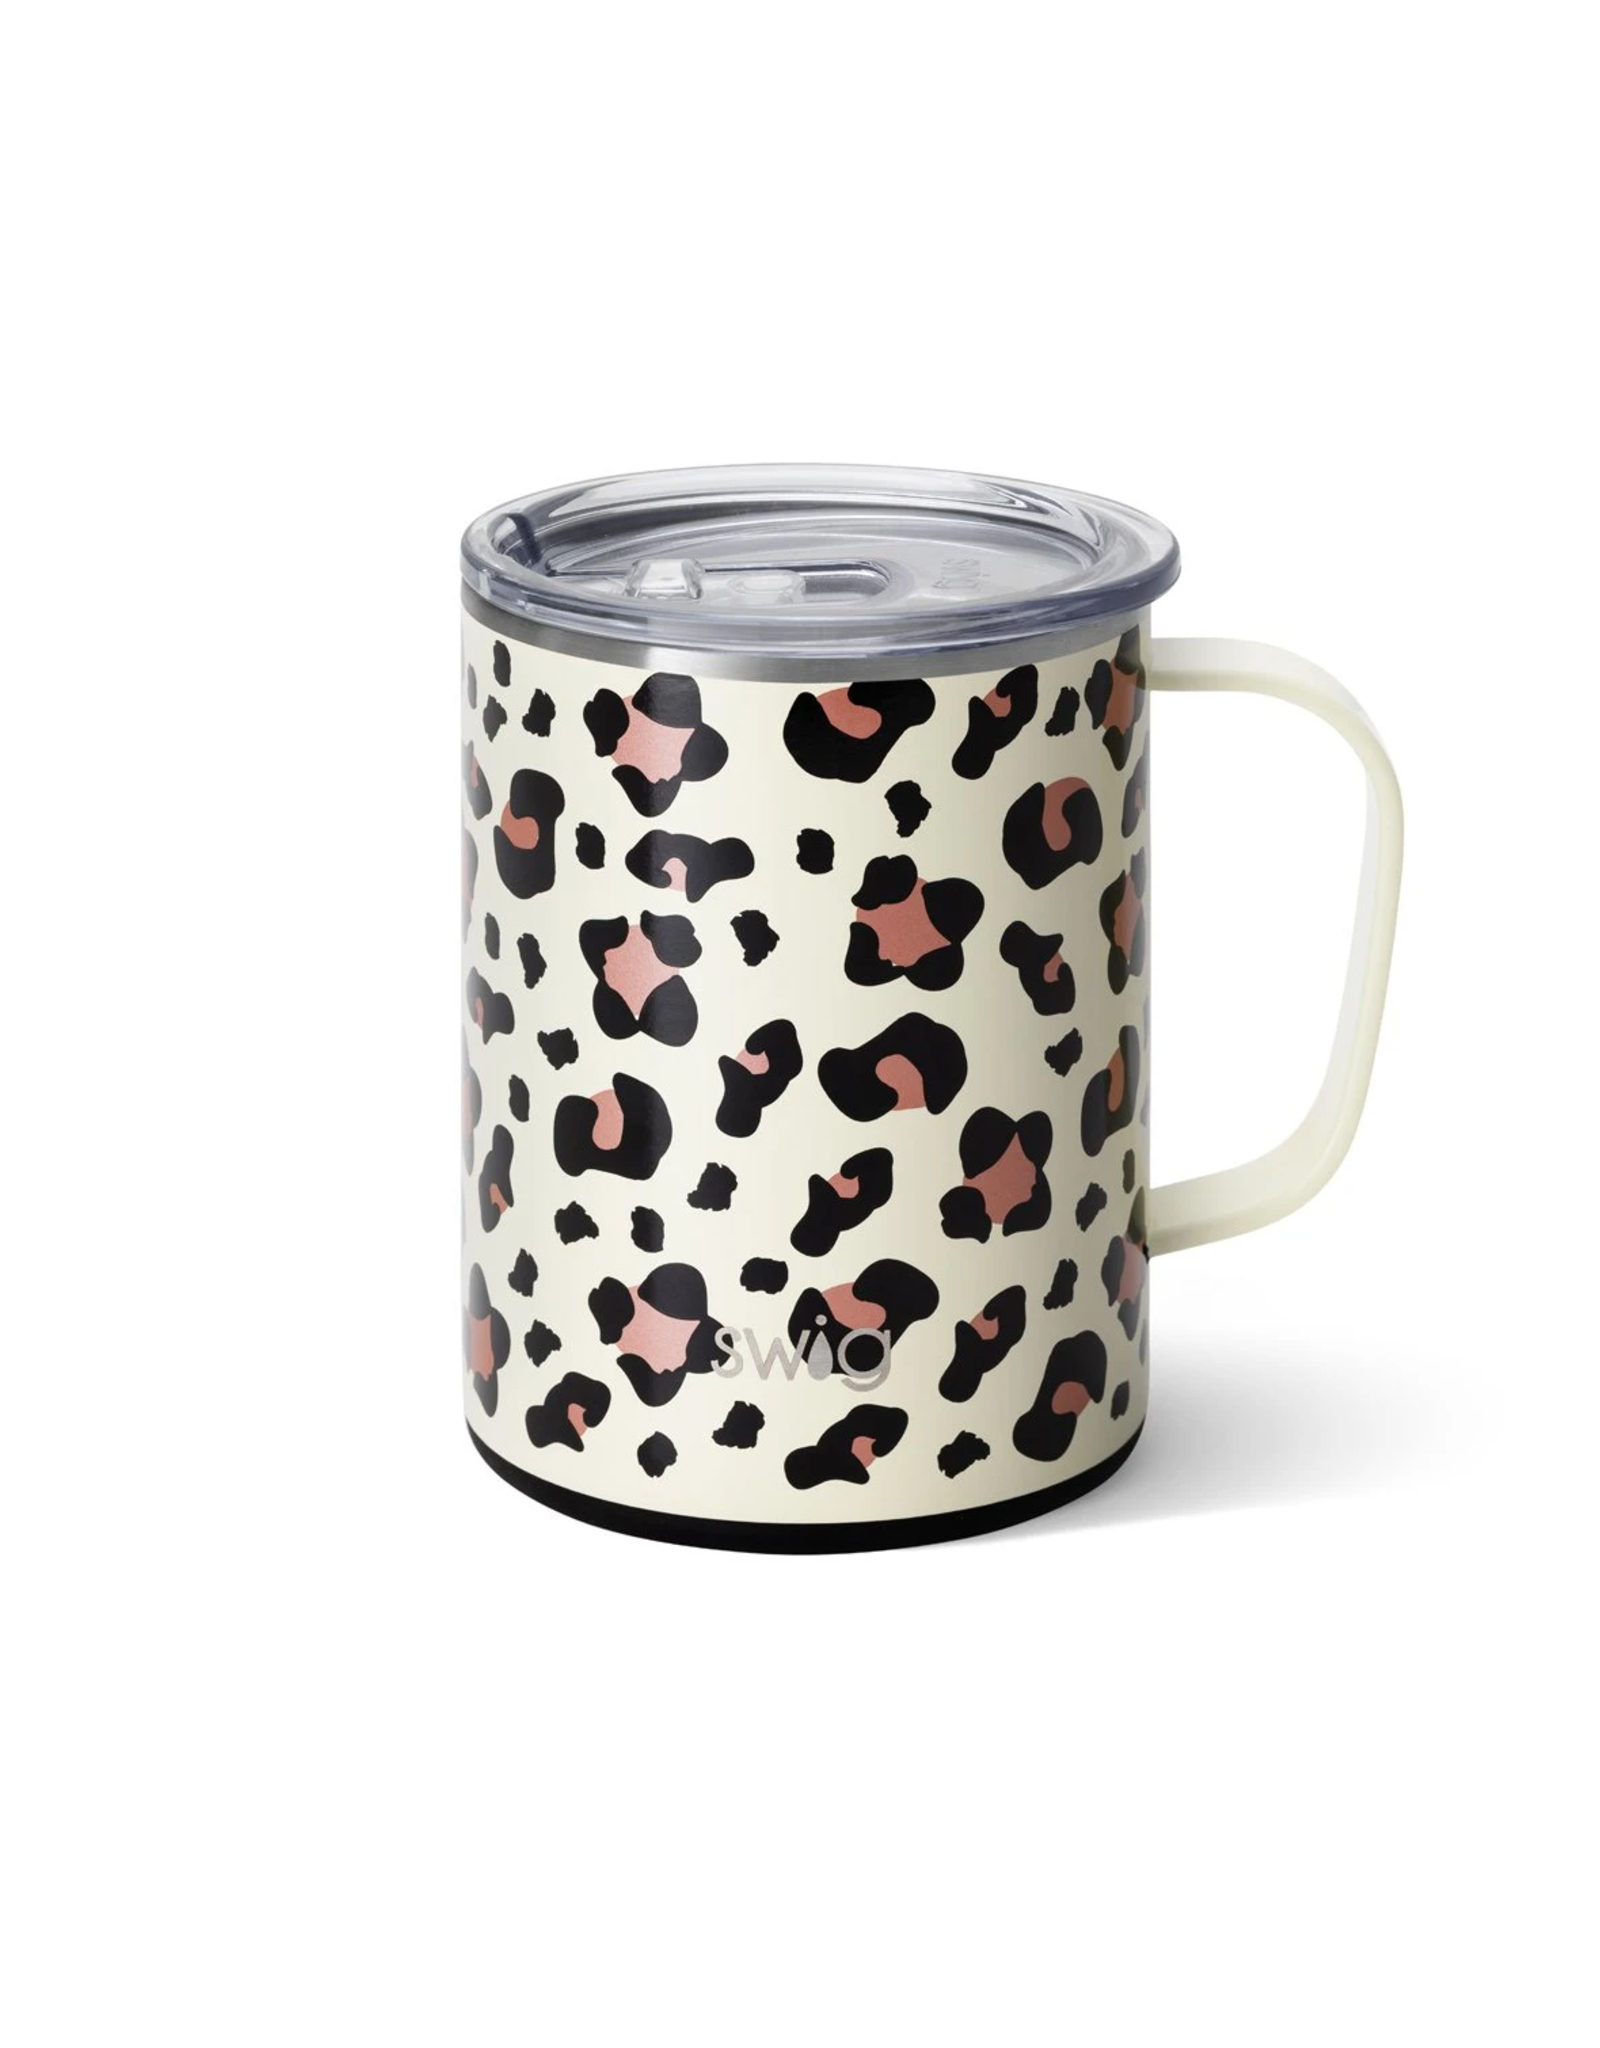 24oz Mega Mug - Luxy Leopard